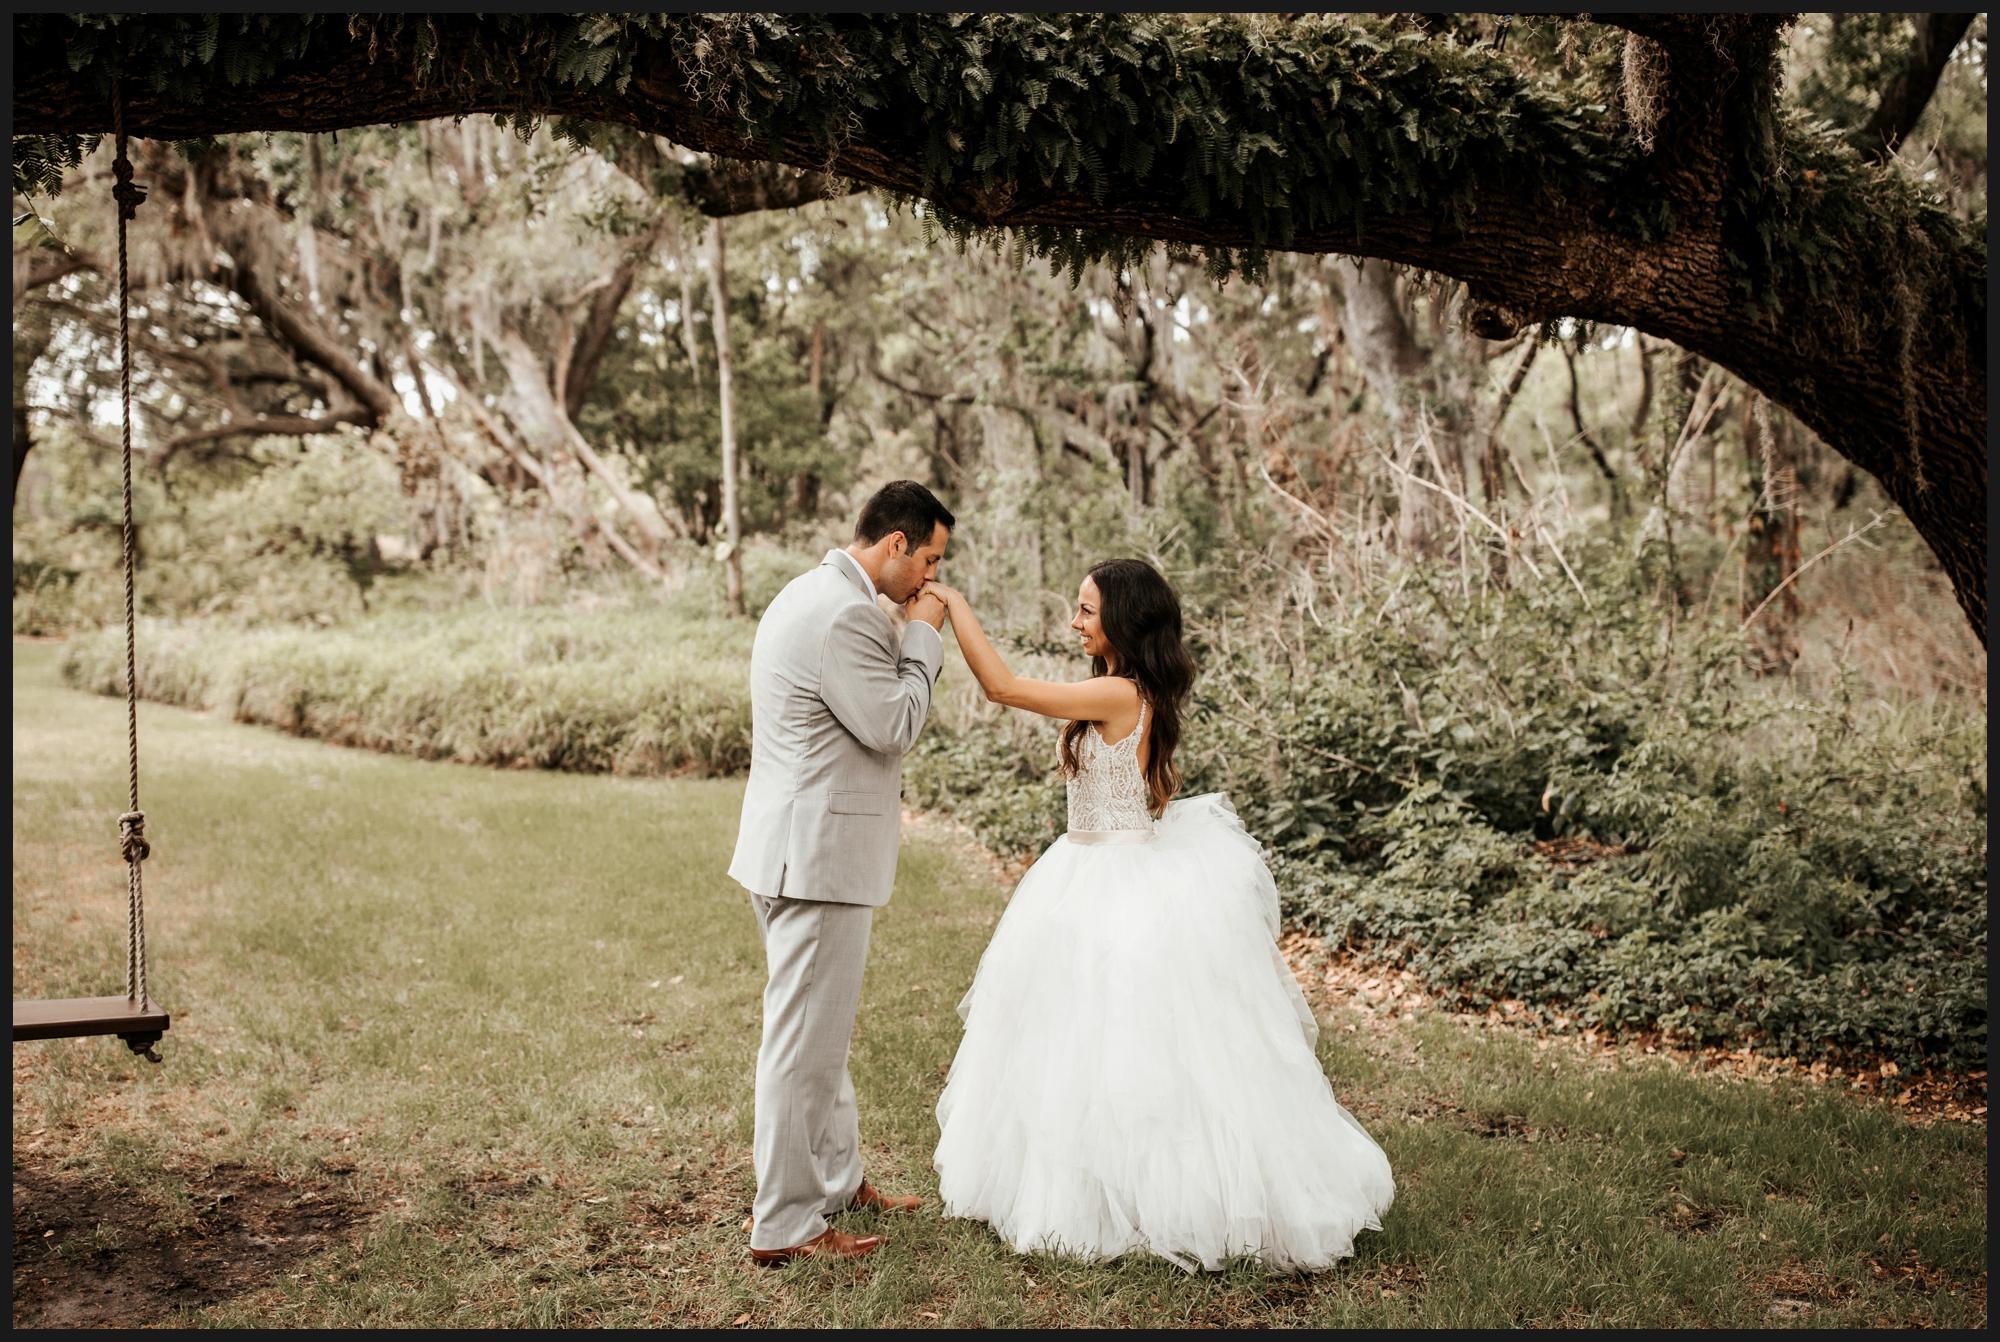 Orlando-Wedding-Photographer-destination-wedding-photographer-florida-wedding-photographer-bohemian-wedding-photographer_1638.jpg